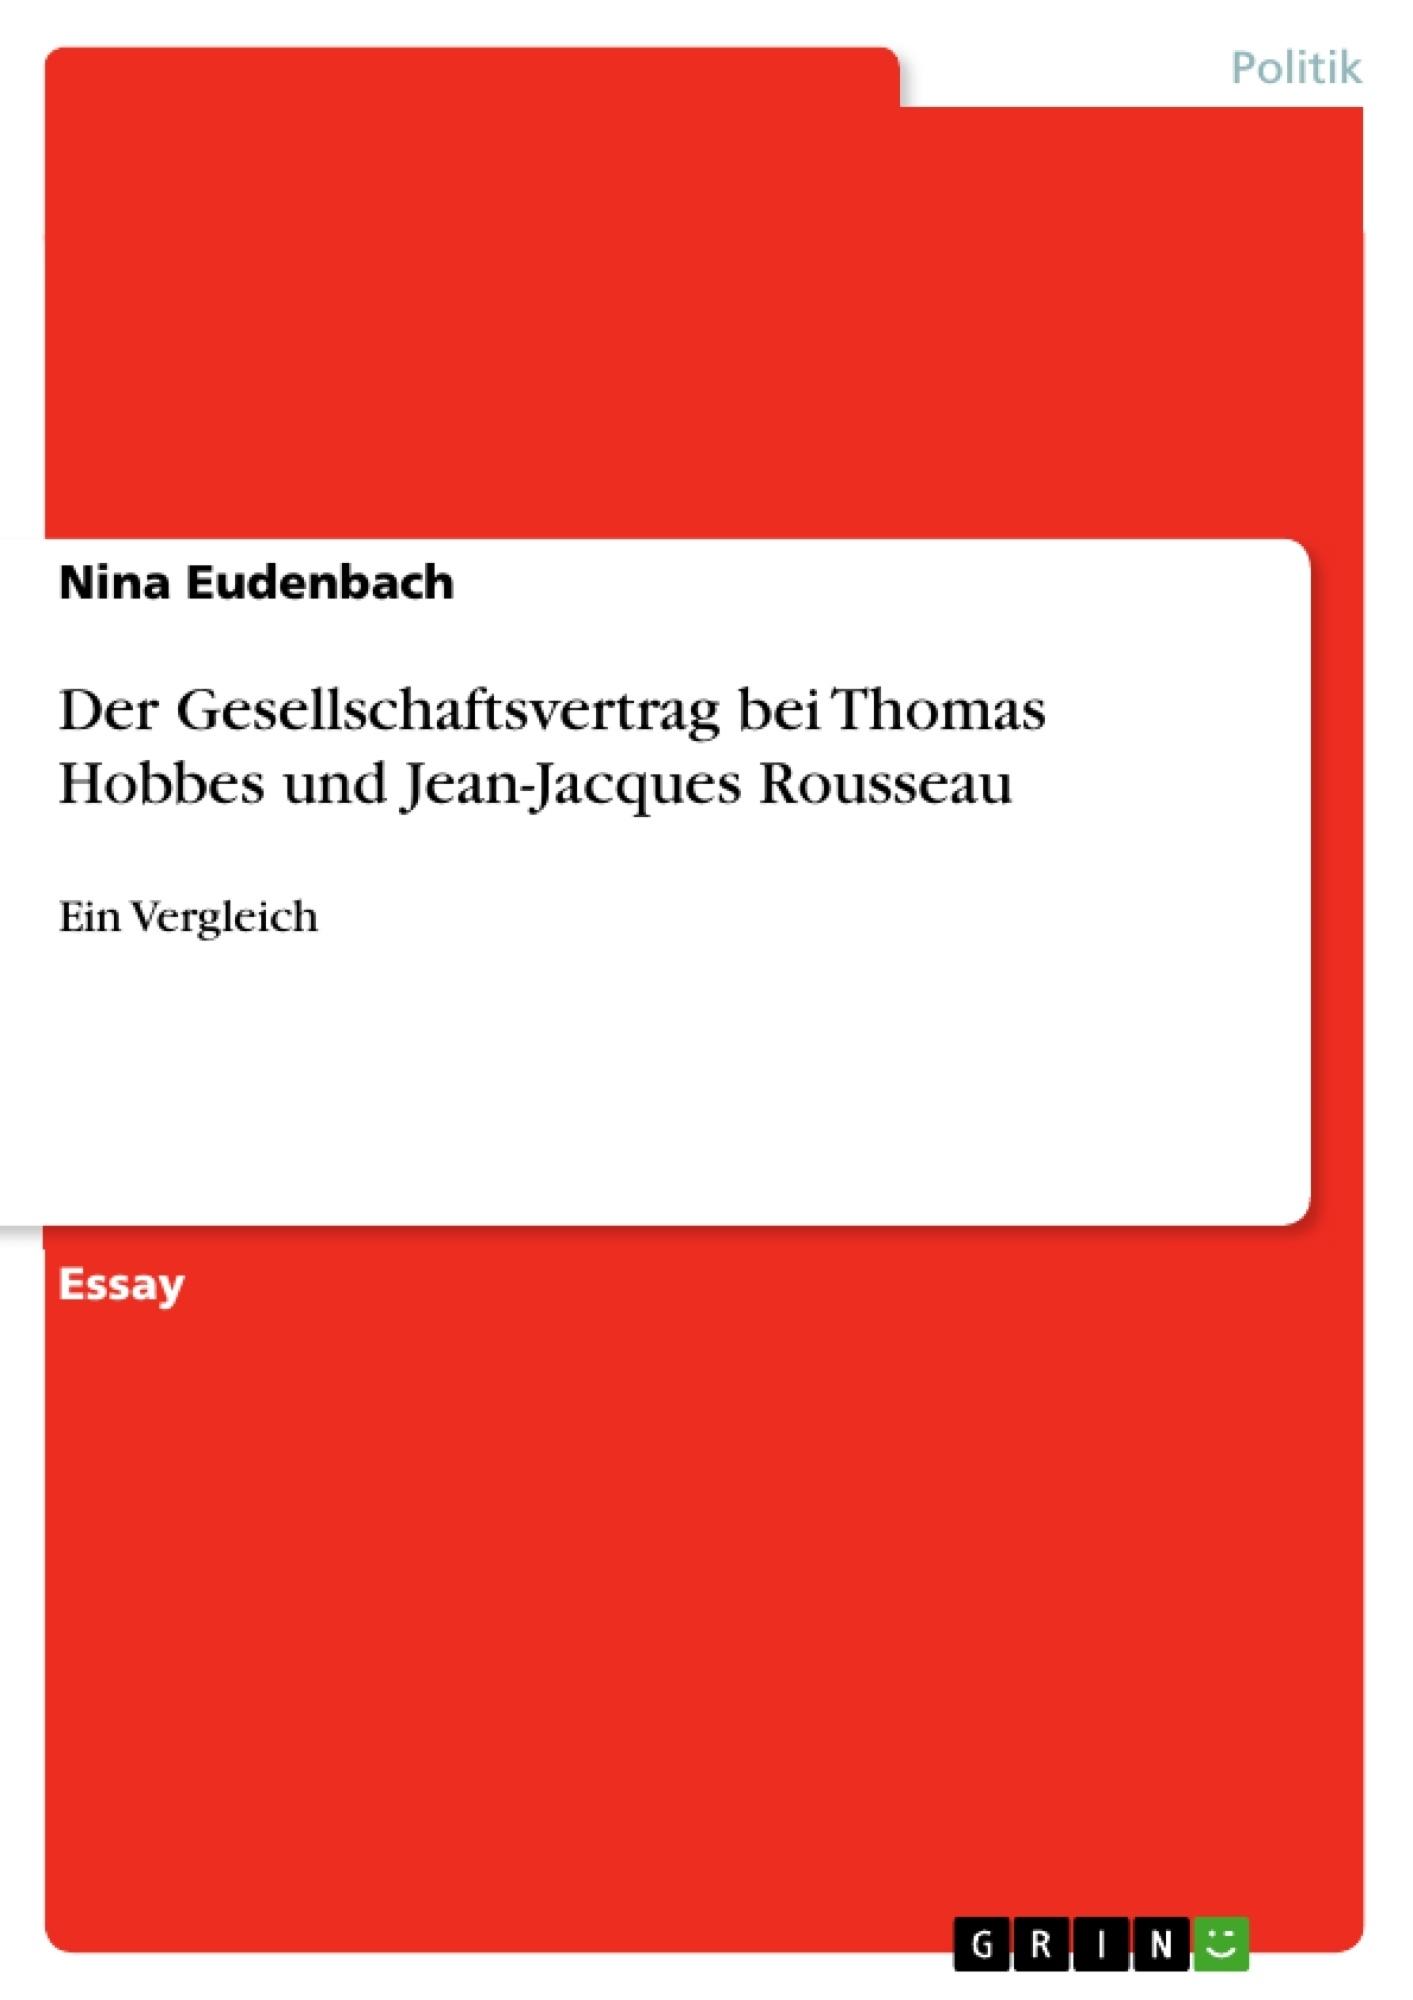 Titel: Der Gesellschaftsvertrag bei Thomas Hobbes und Jean-Jacques Rousseau